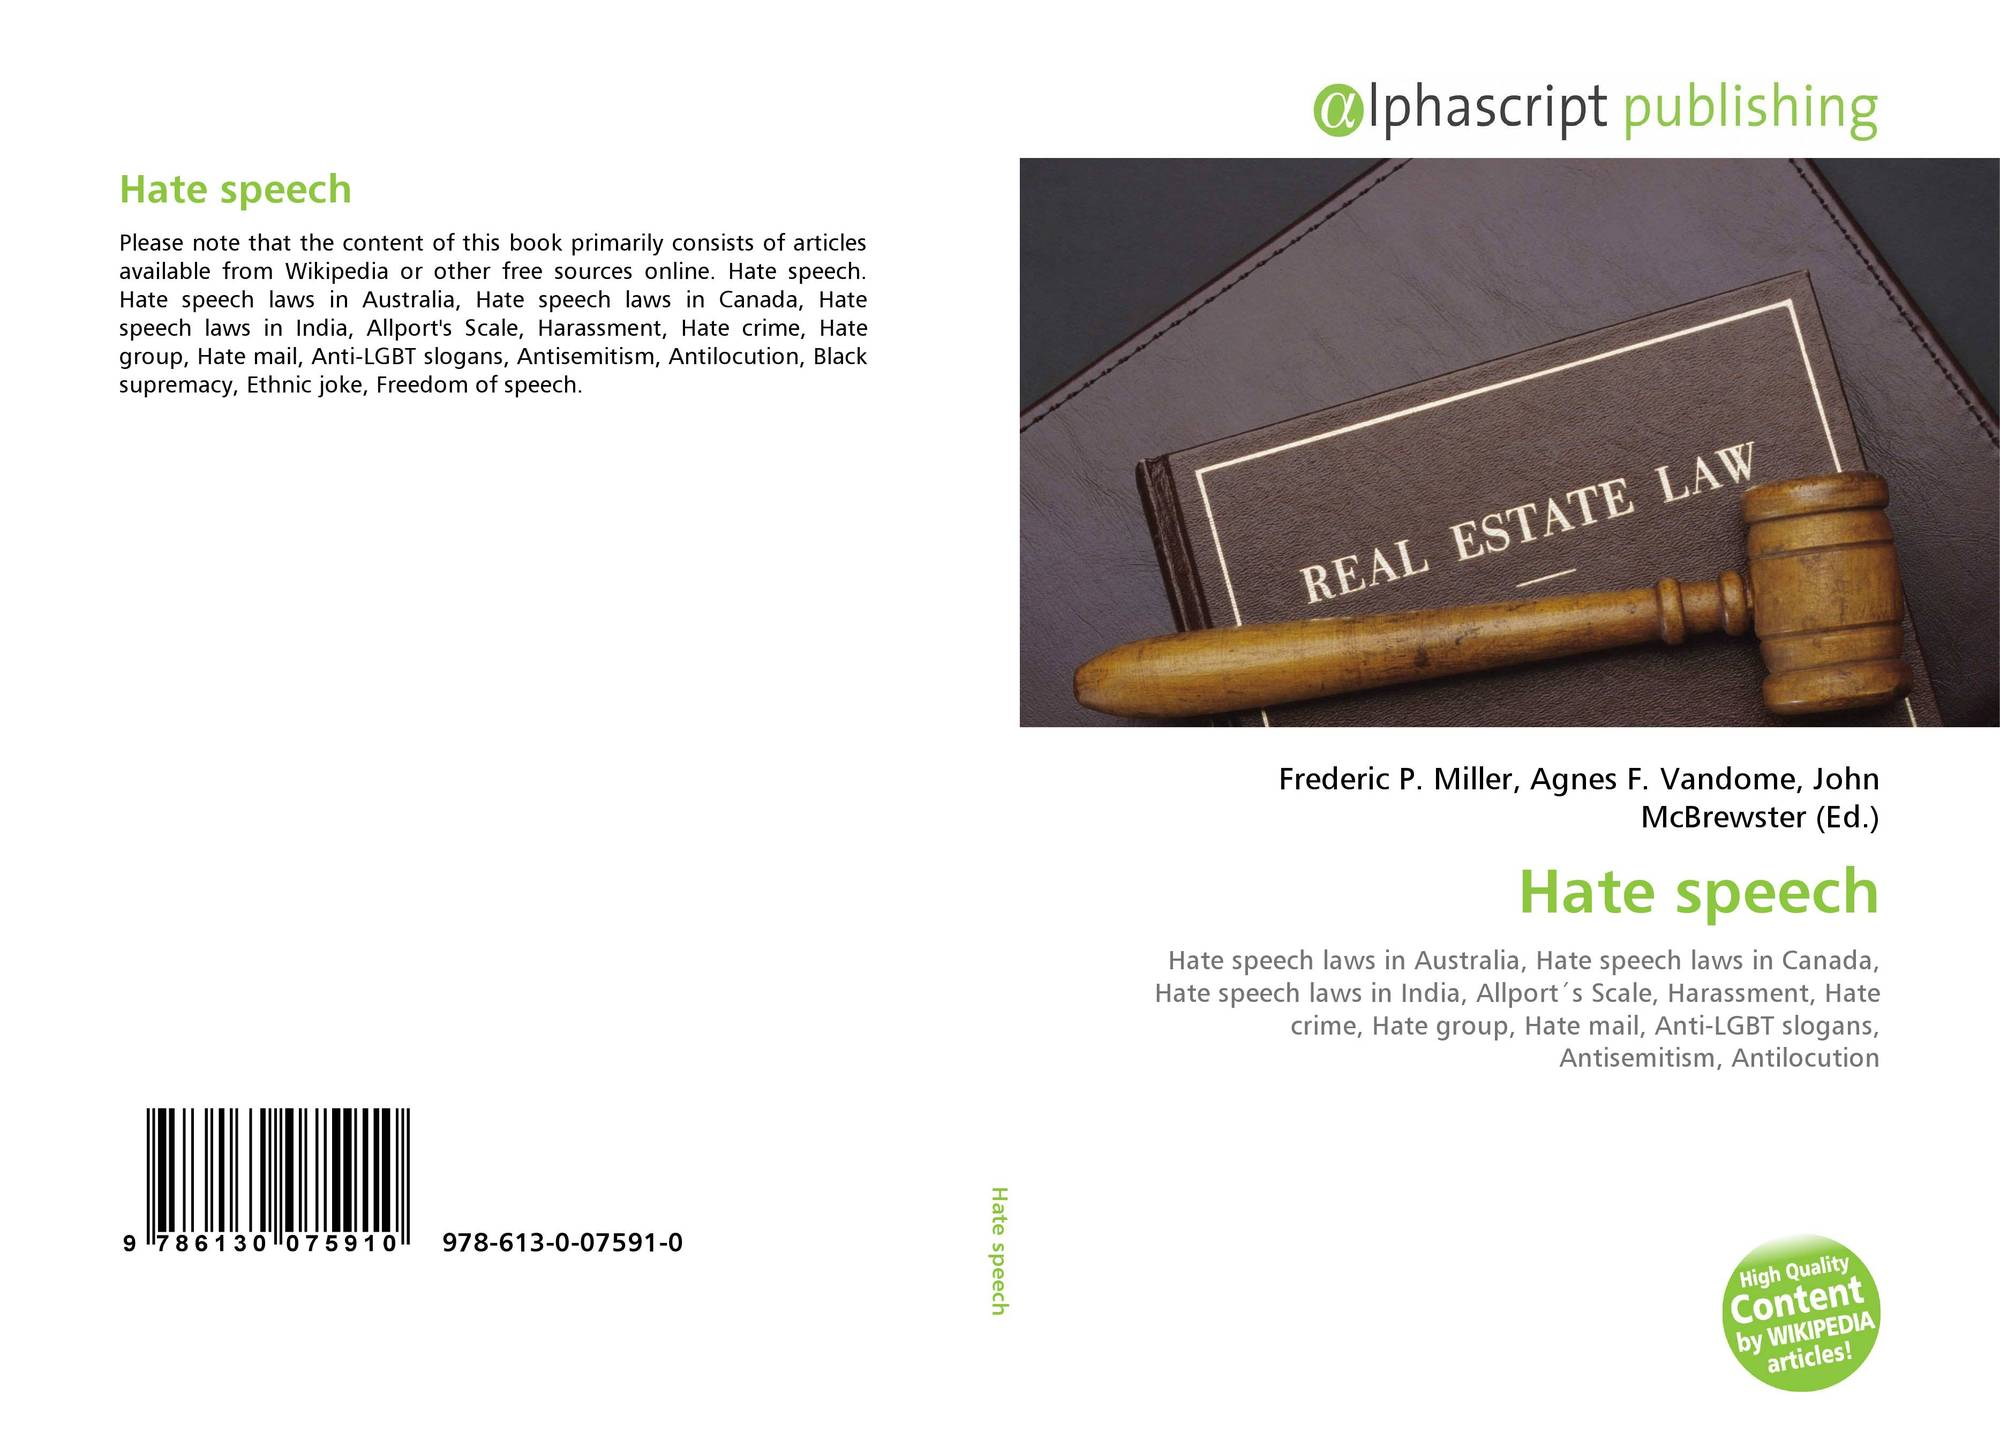 hate speech legal but unnecessary